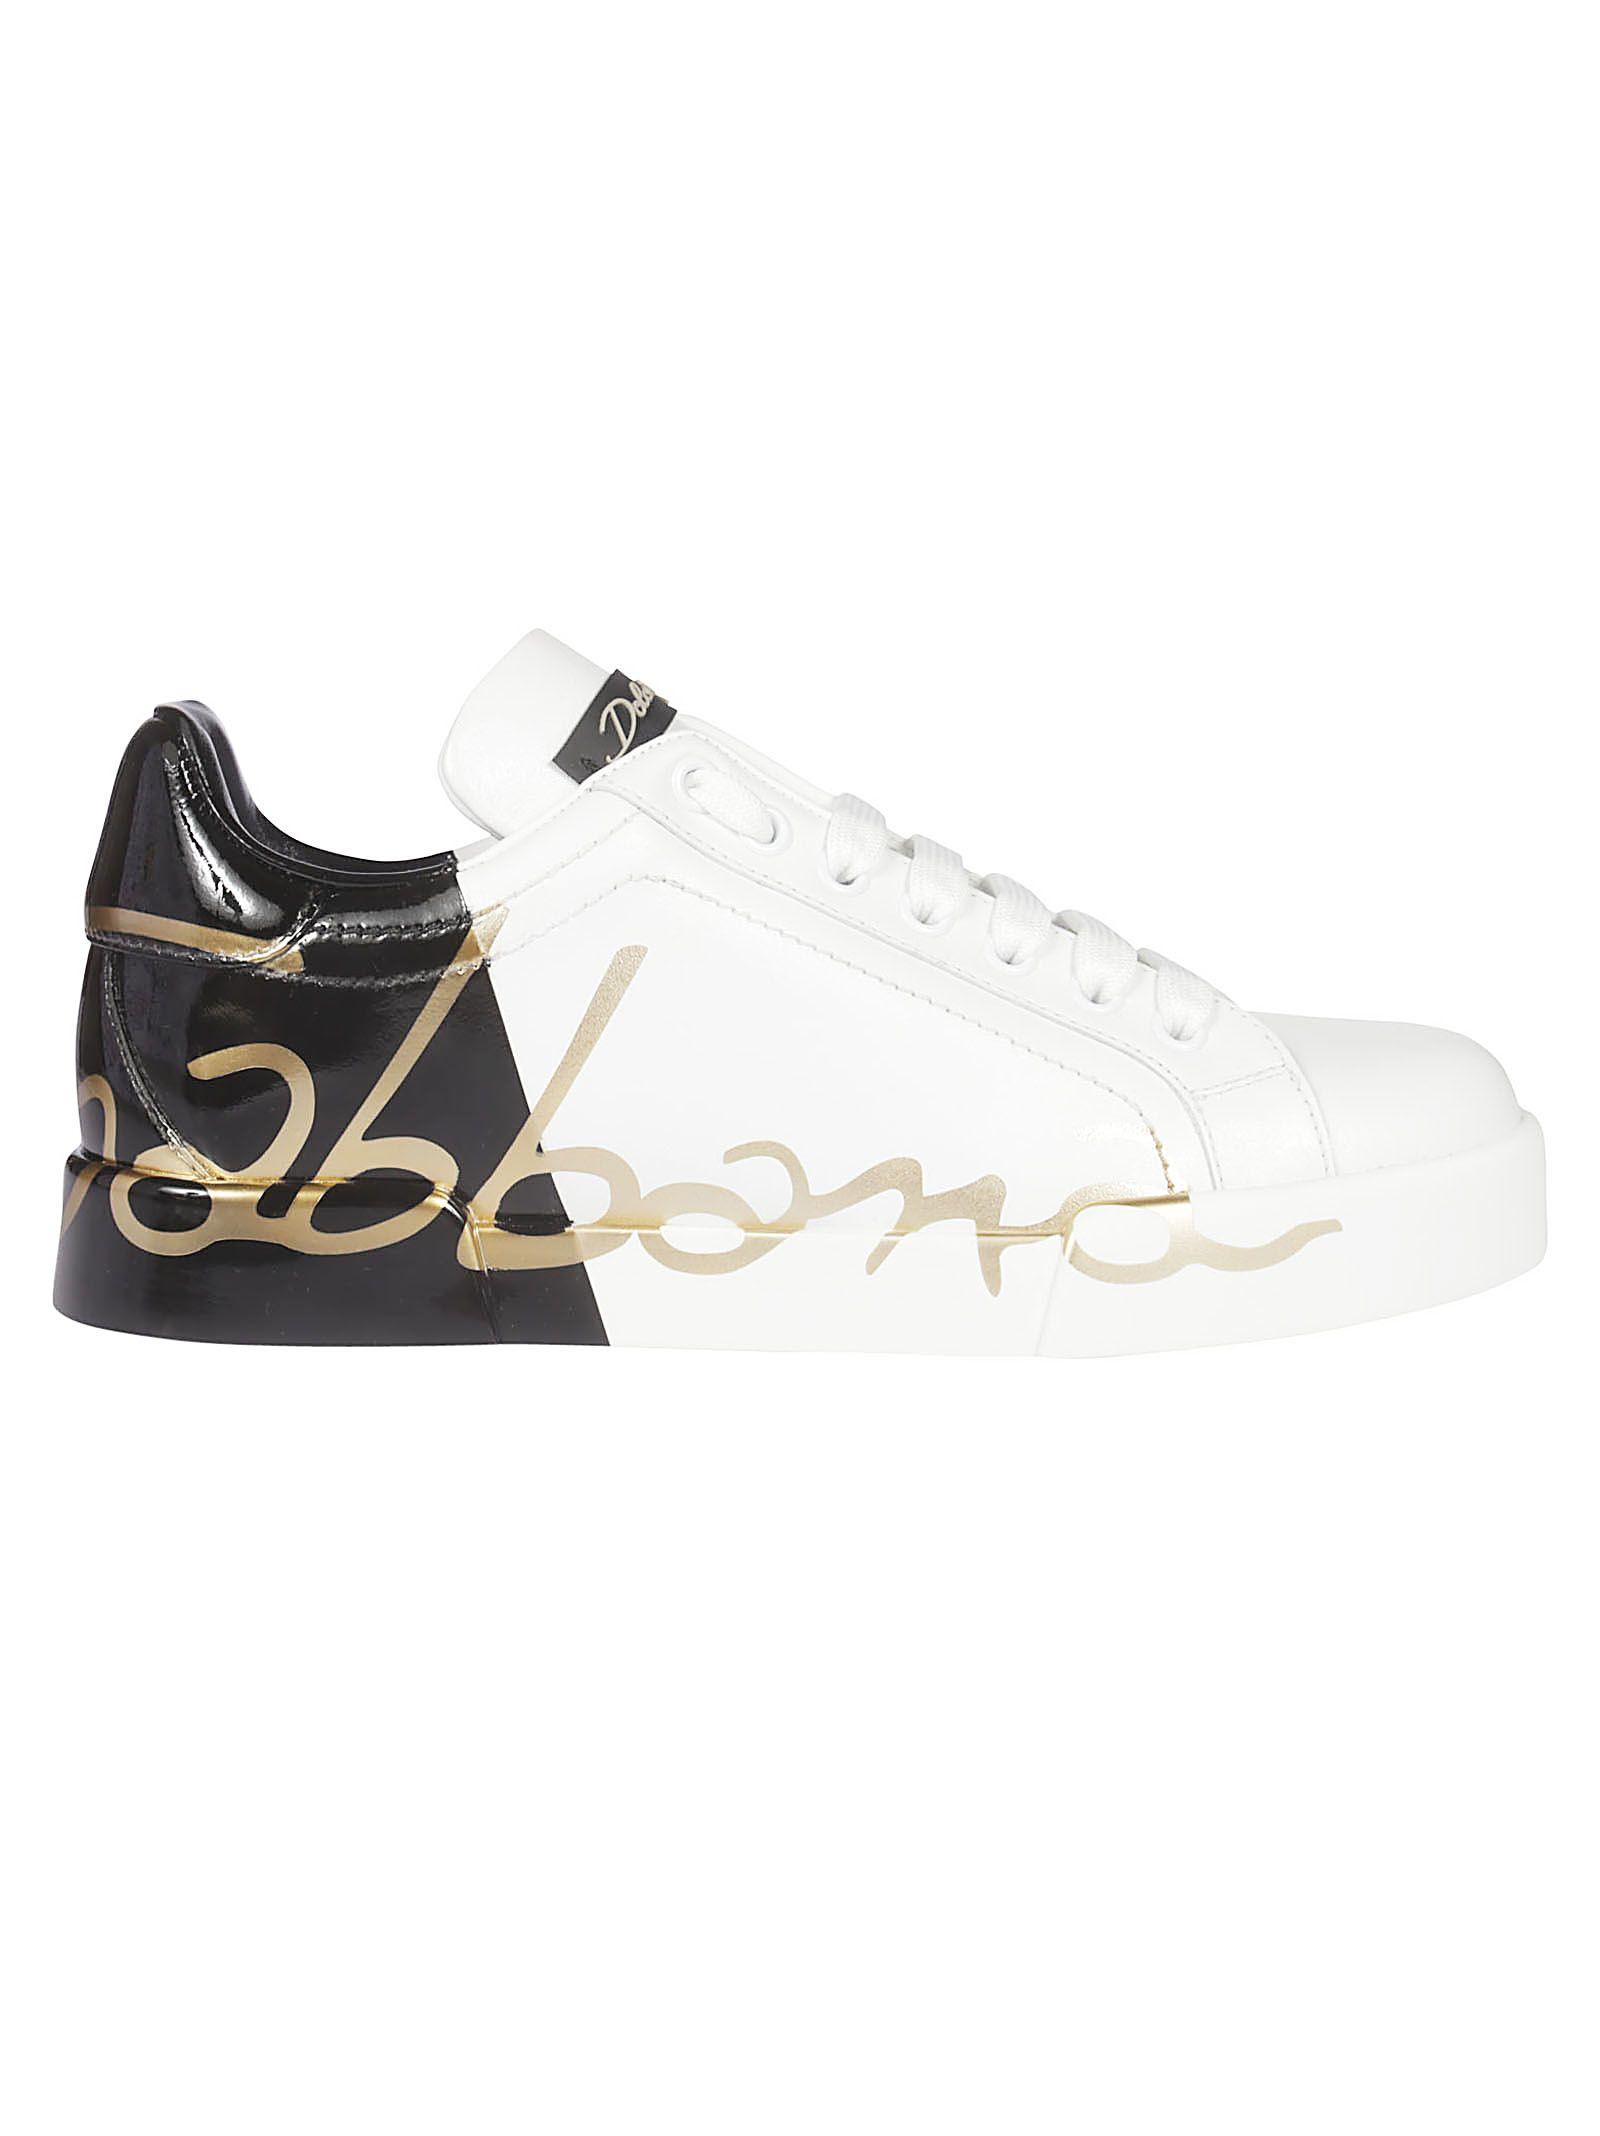 dolce & gabbana -  Printed Low-cut Sneakers